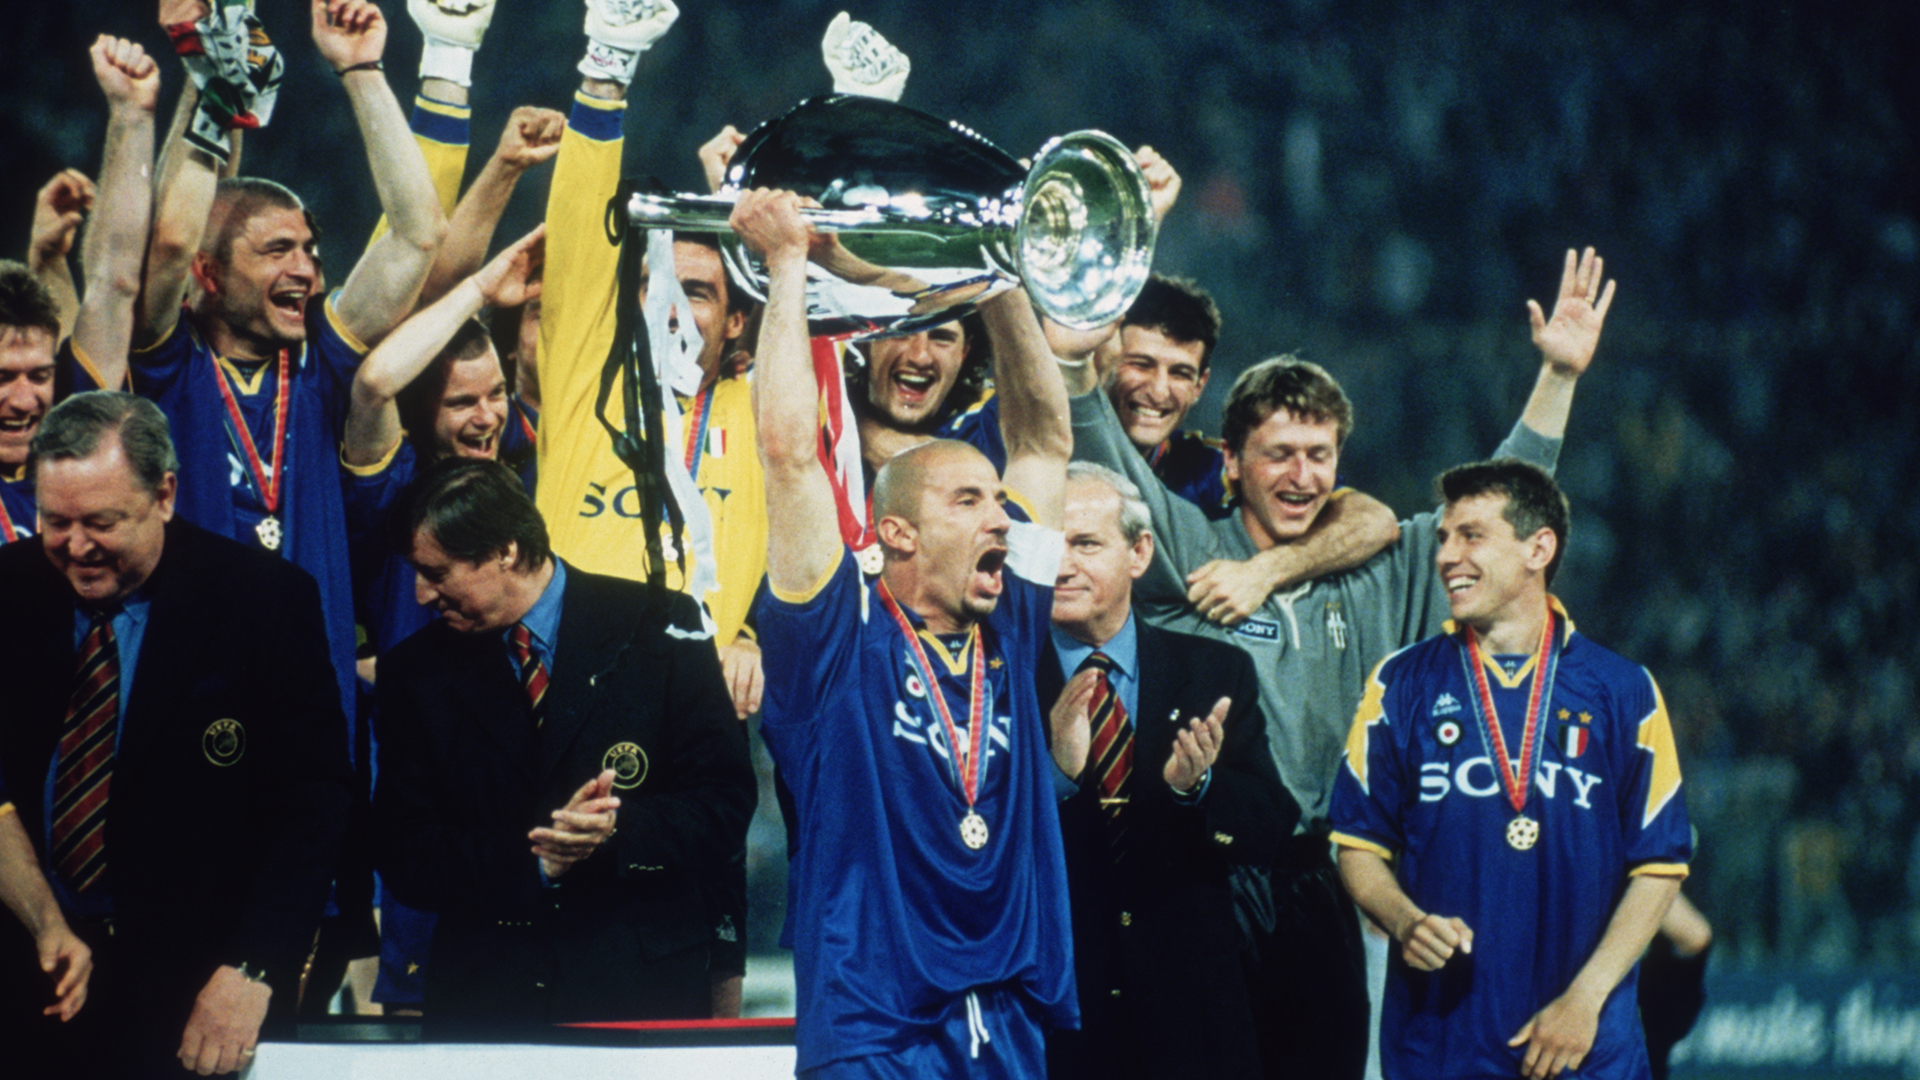 Are Massimiliano Allegri S Record Breakers Now Better Than The Juventus Of Zinedine Zidane Or Michel Platini Goal Com